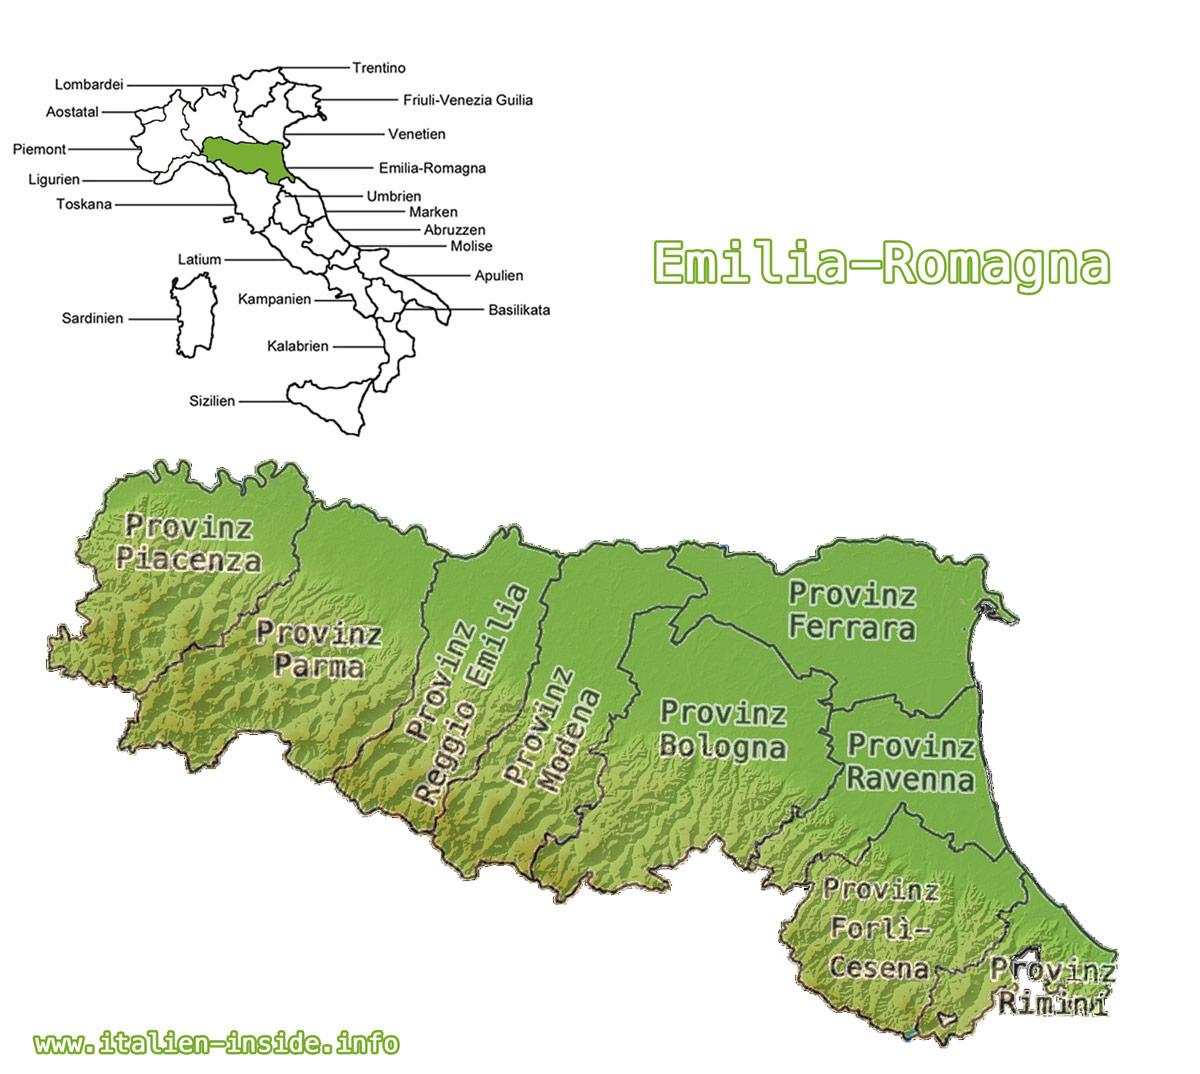 Karte-Emilia-Romagna-mit-Provinzen